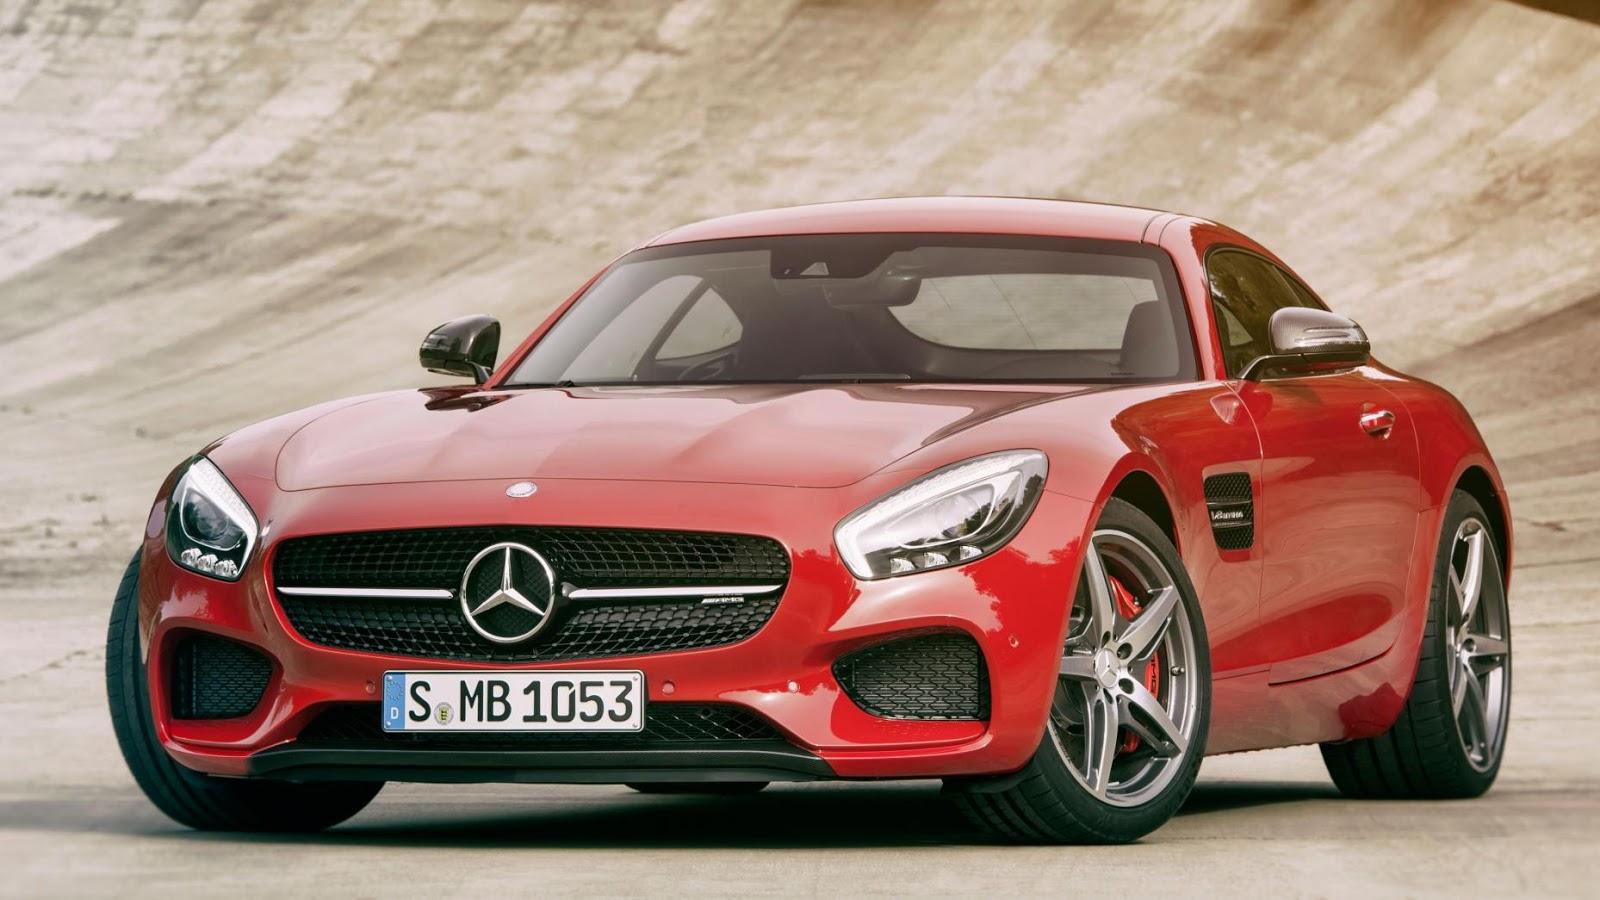 Mercedes-AMG GT: £ 97.210